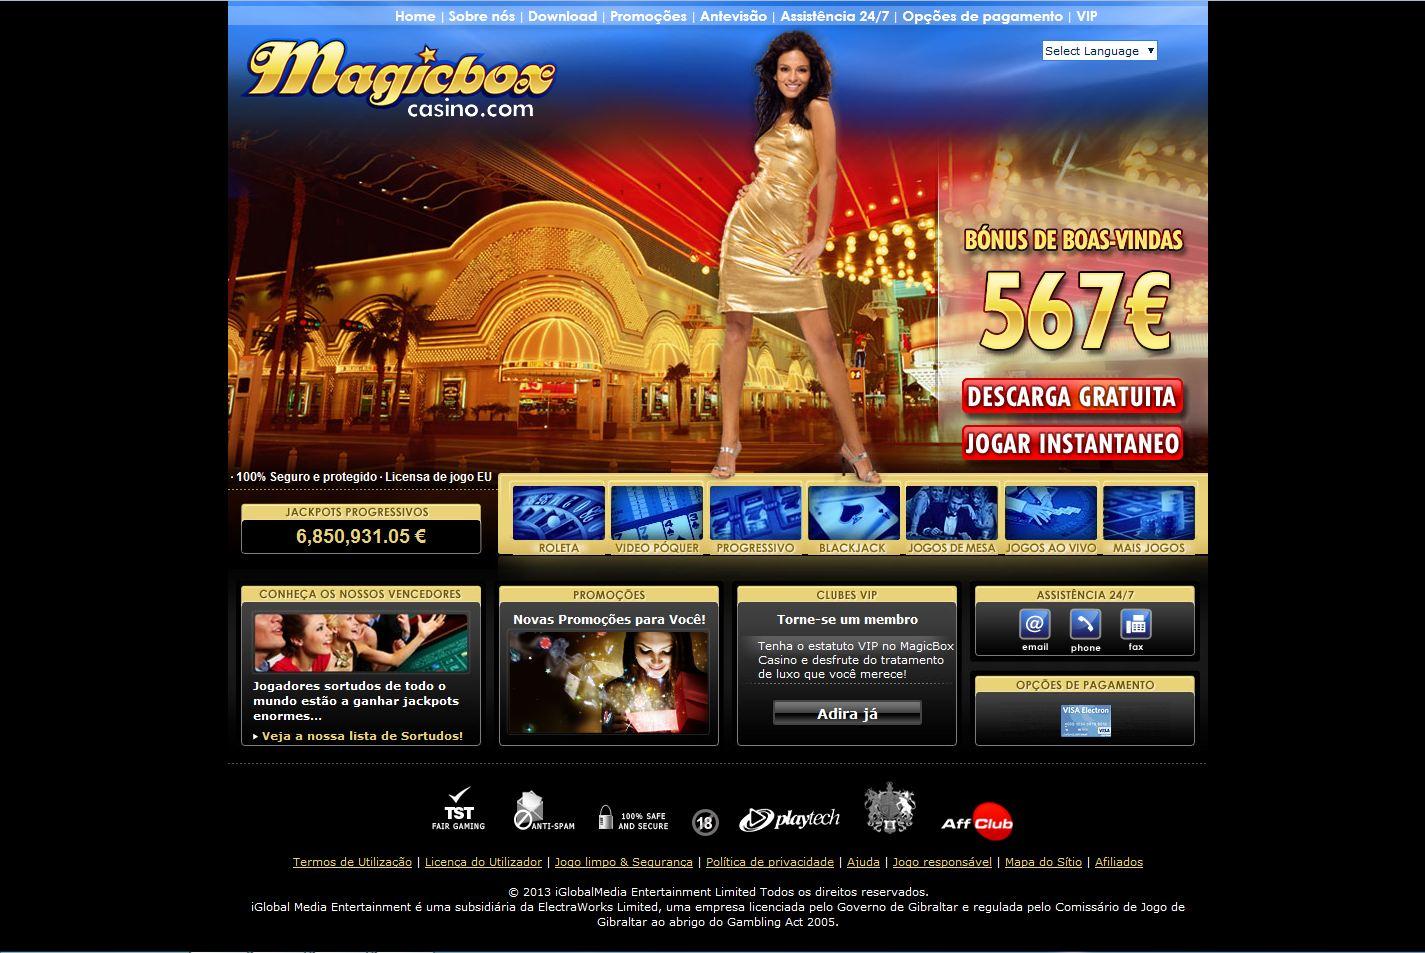 Casino Diskussion 329717